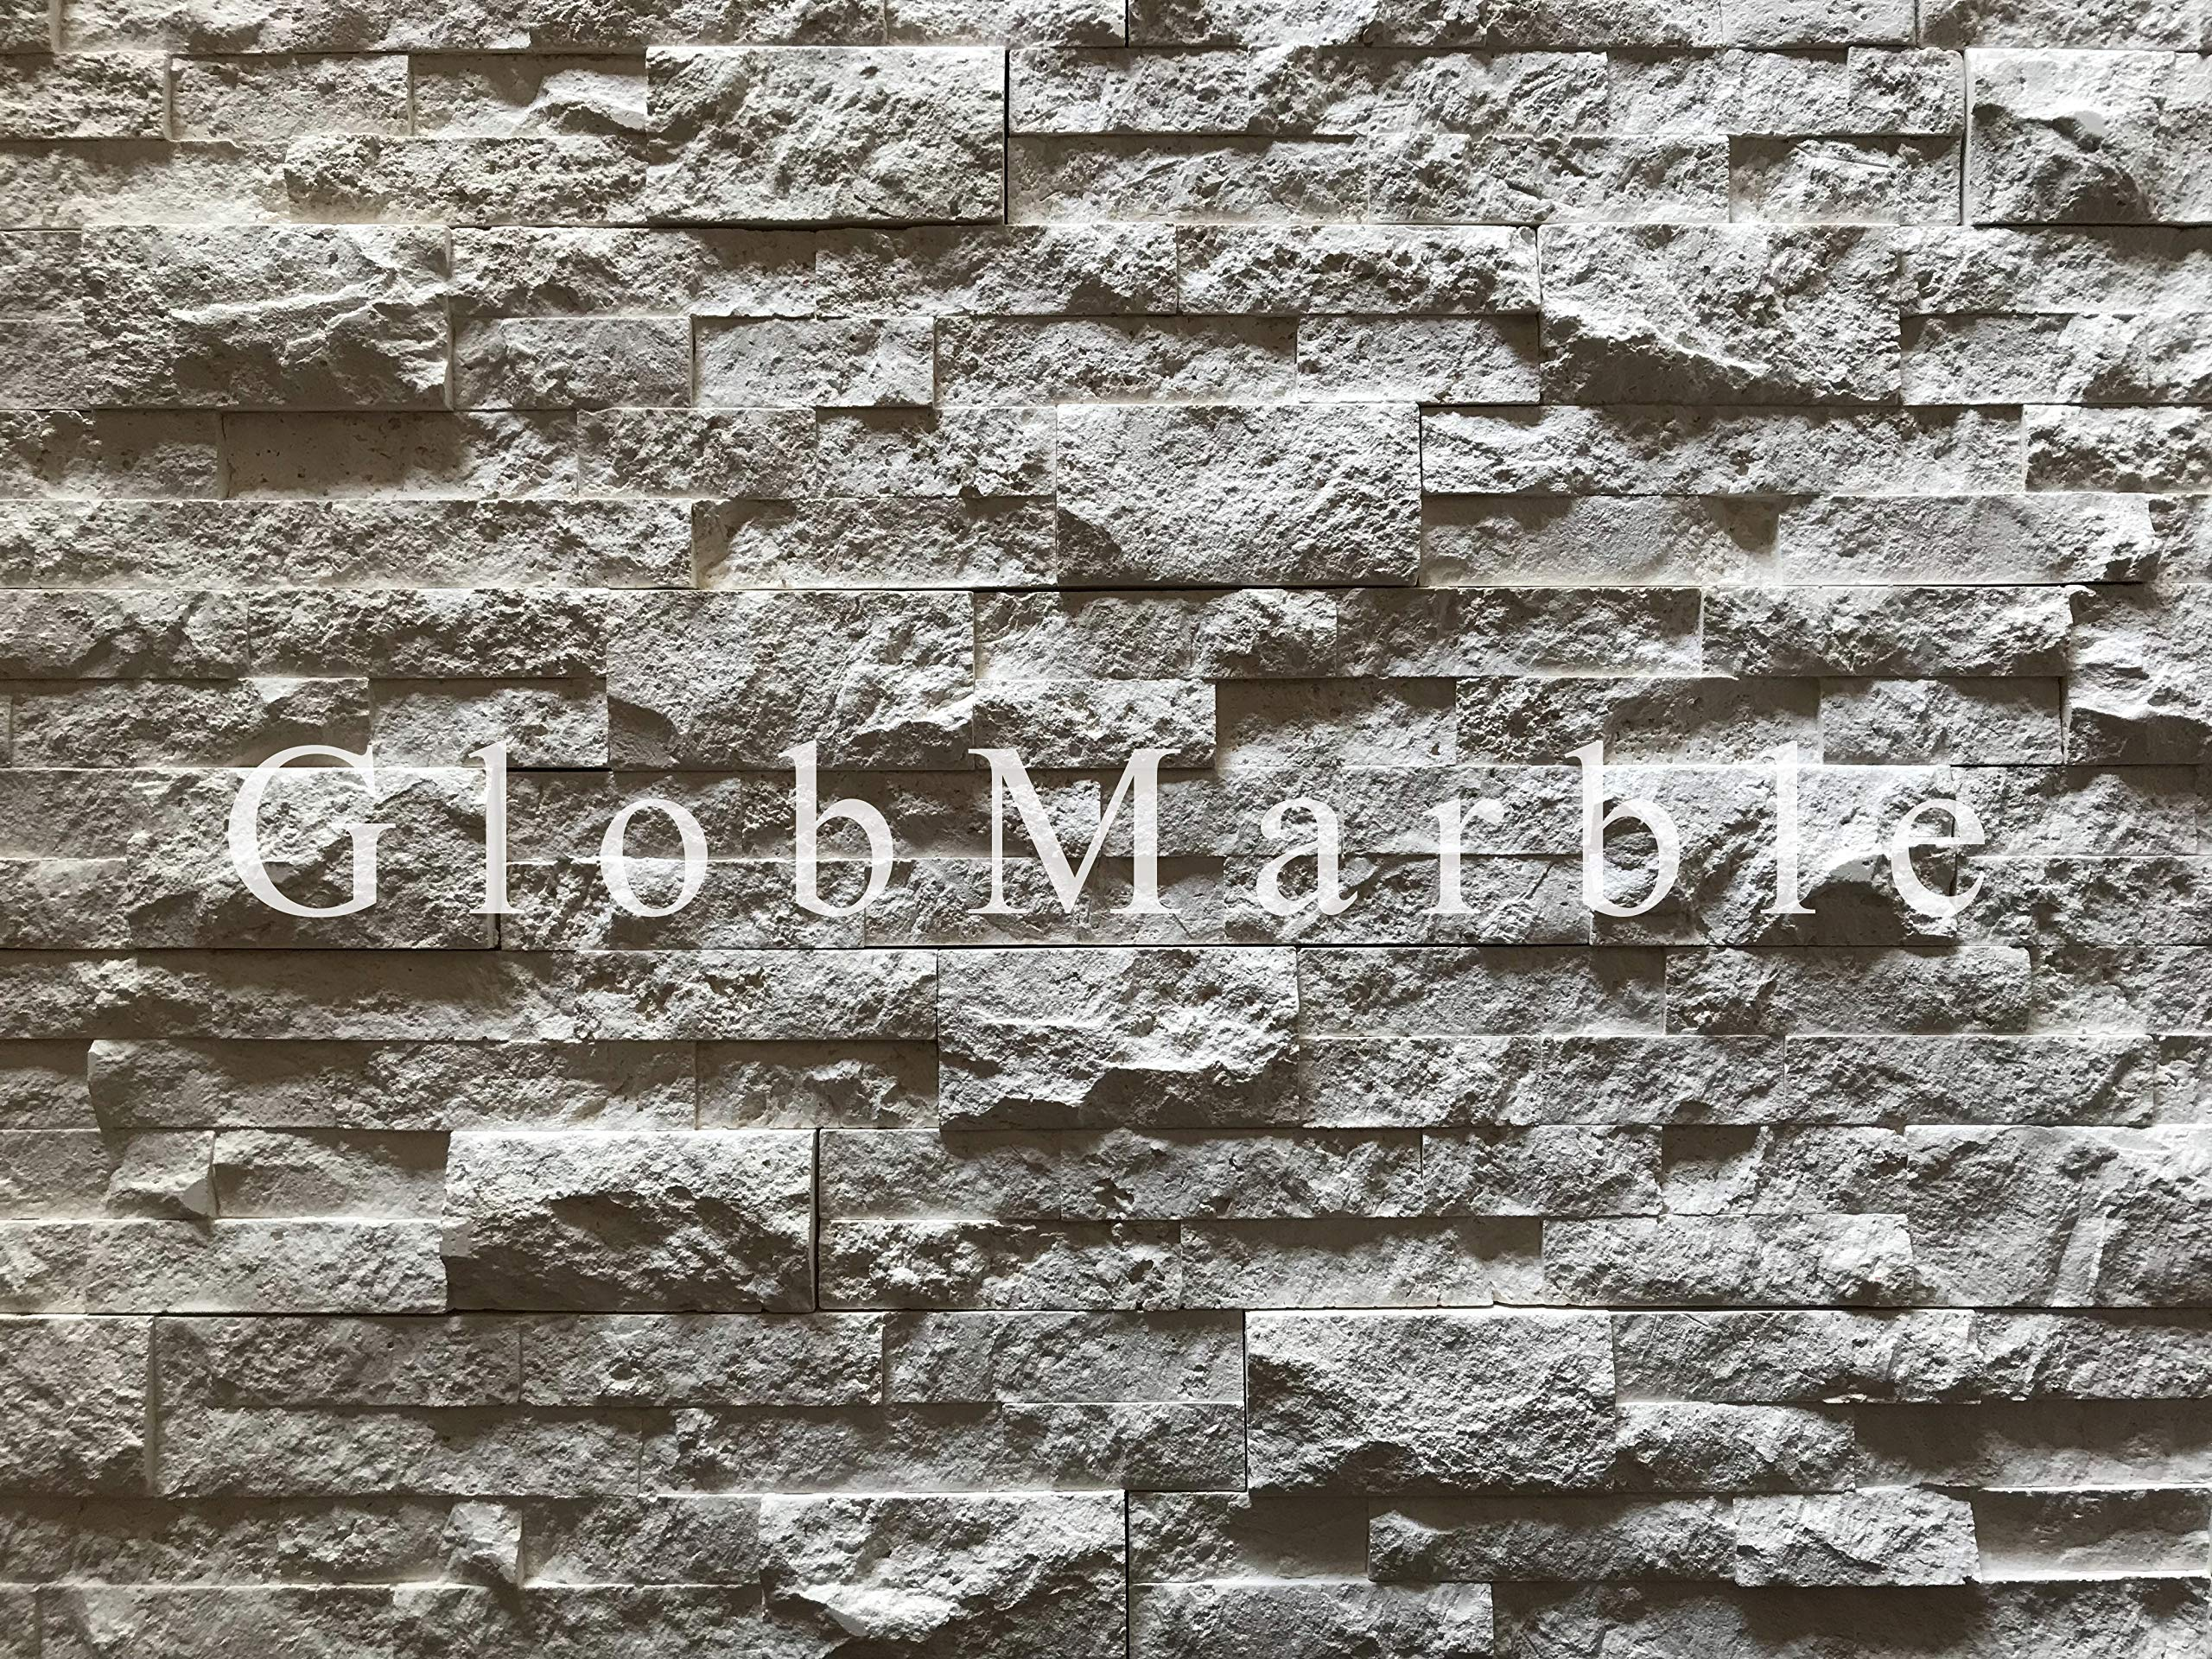 Veneer Stone Mold VS 502/4. Concrete Stone Mold by GlobMarble